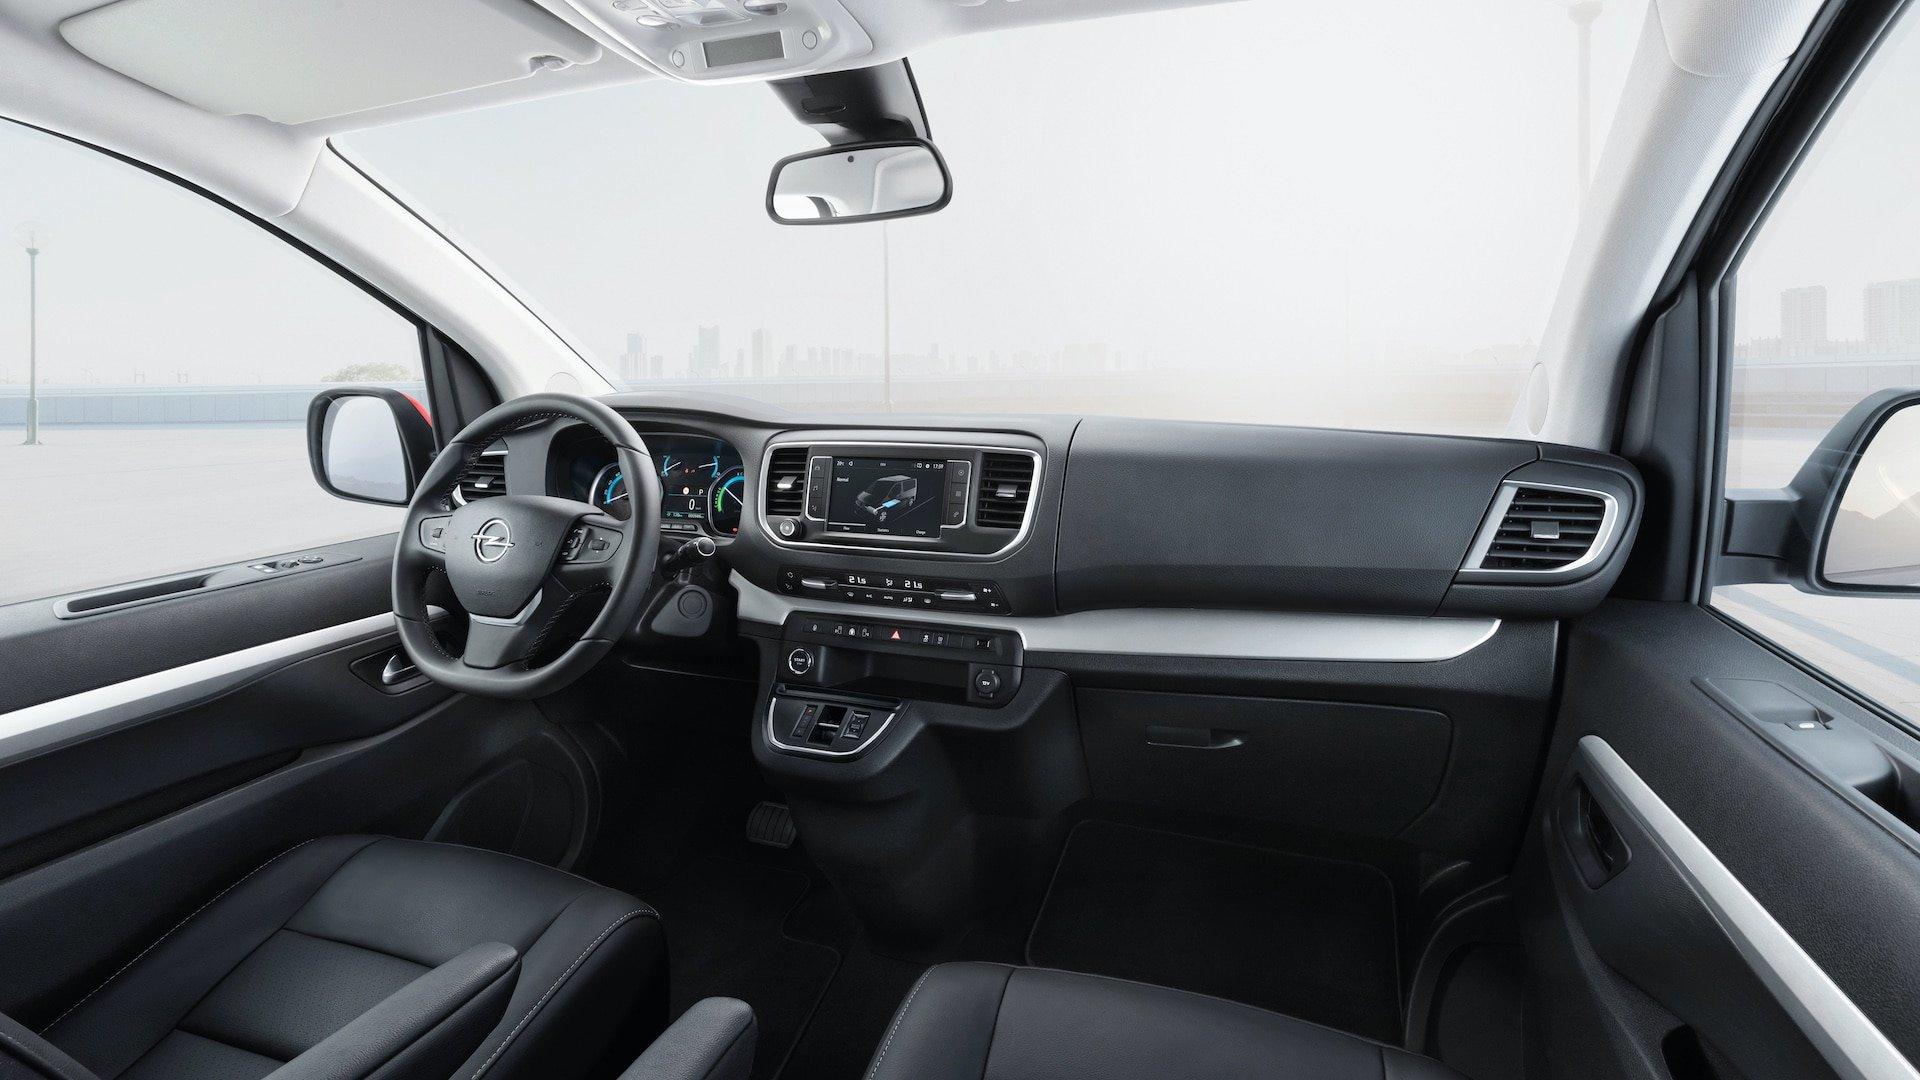 Opel Zafira-e Elektro-Van Cockpit